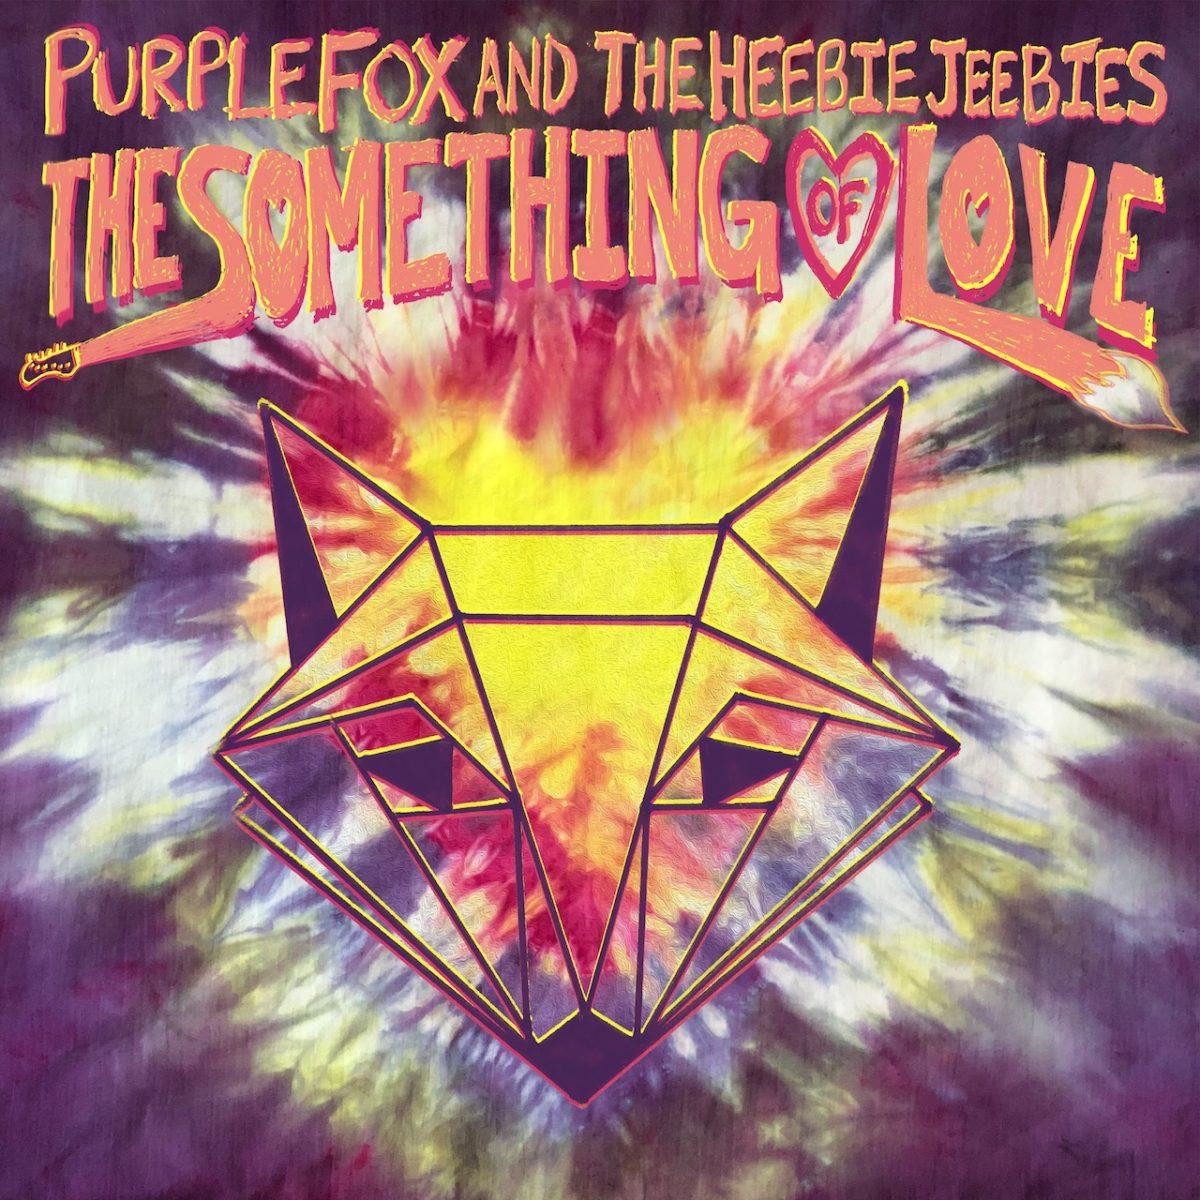 """The Something of Love"" by Purple Fox and the Heebie Jeebies"